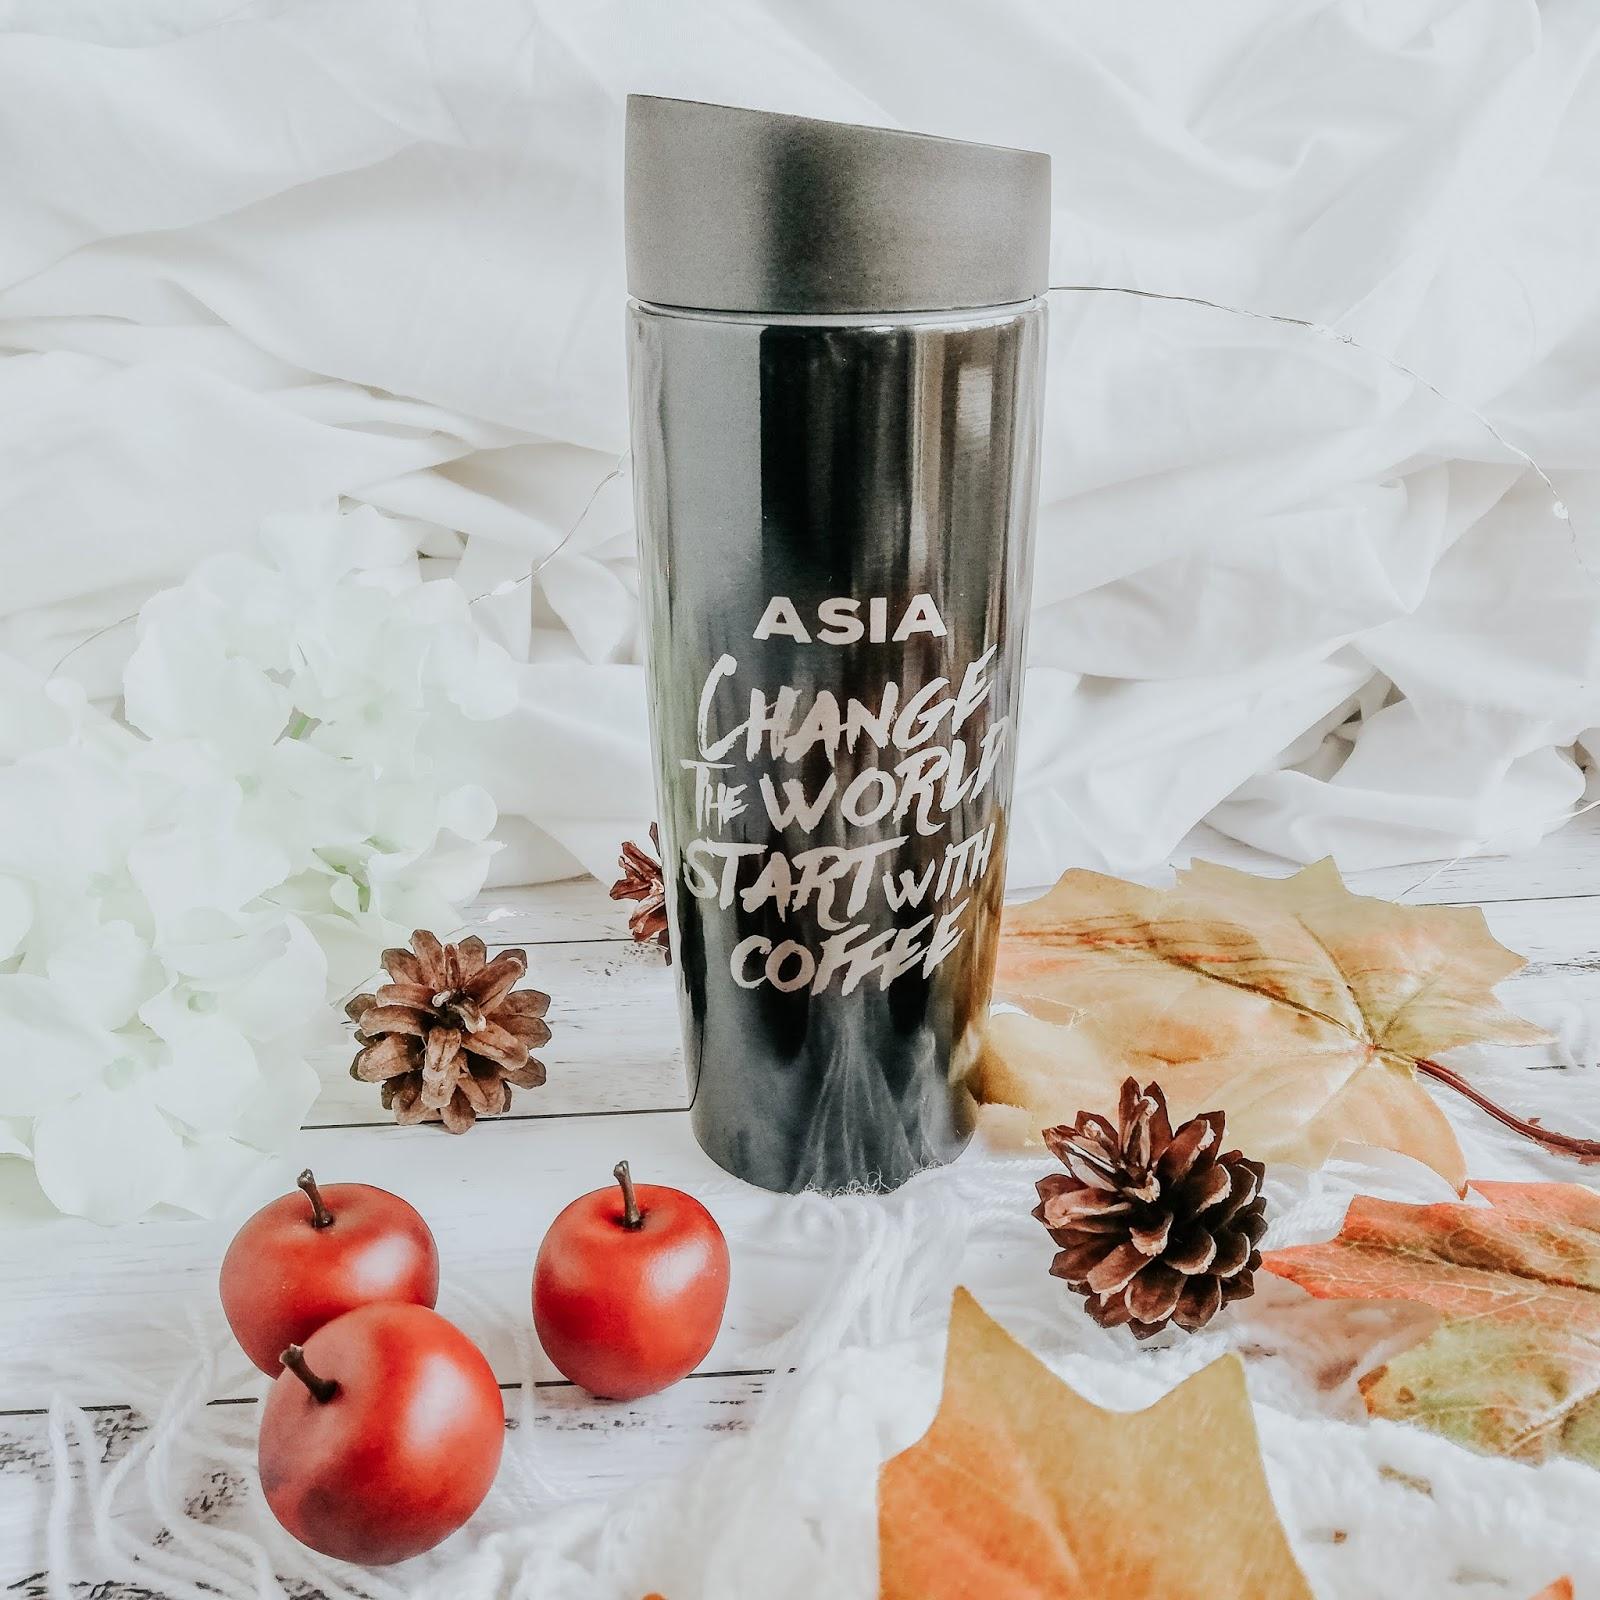 ciepła kawa, ciepła herbata, pomysł na prezent